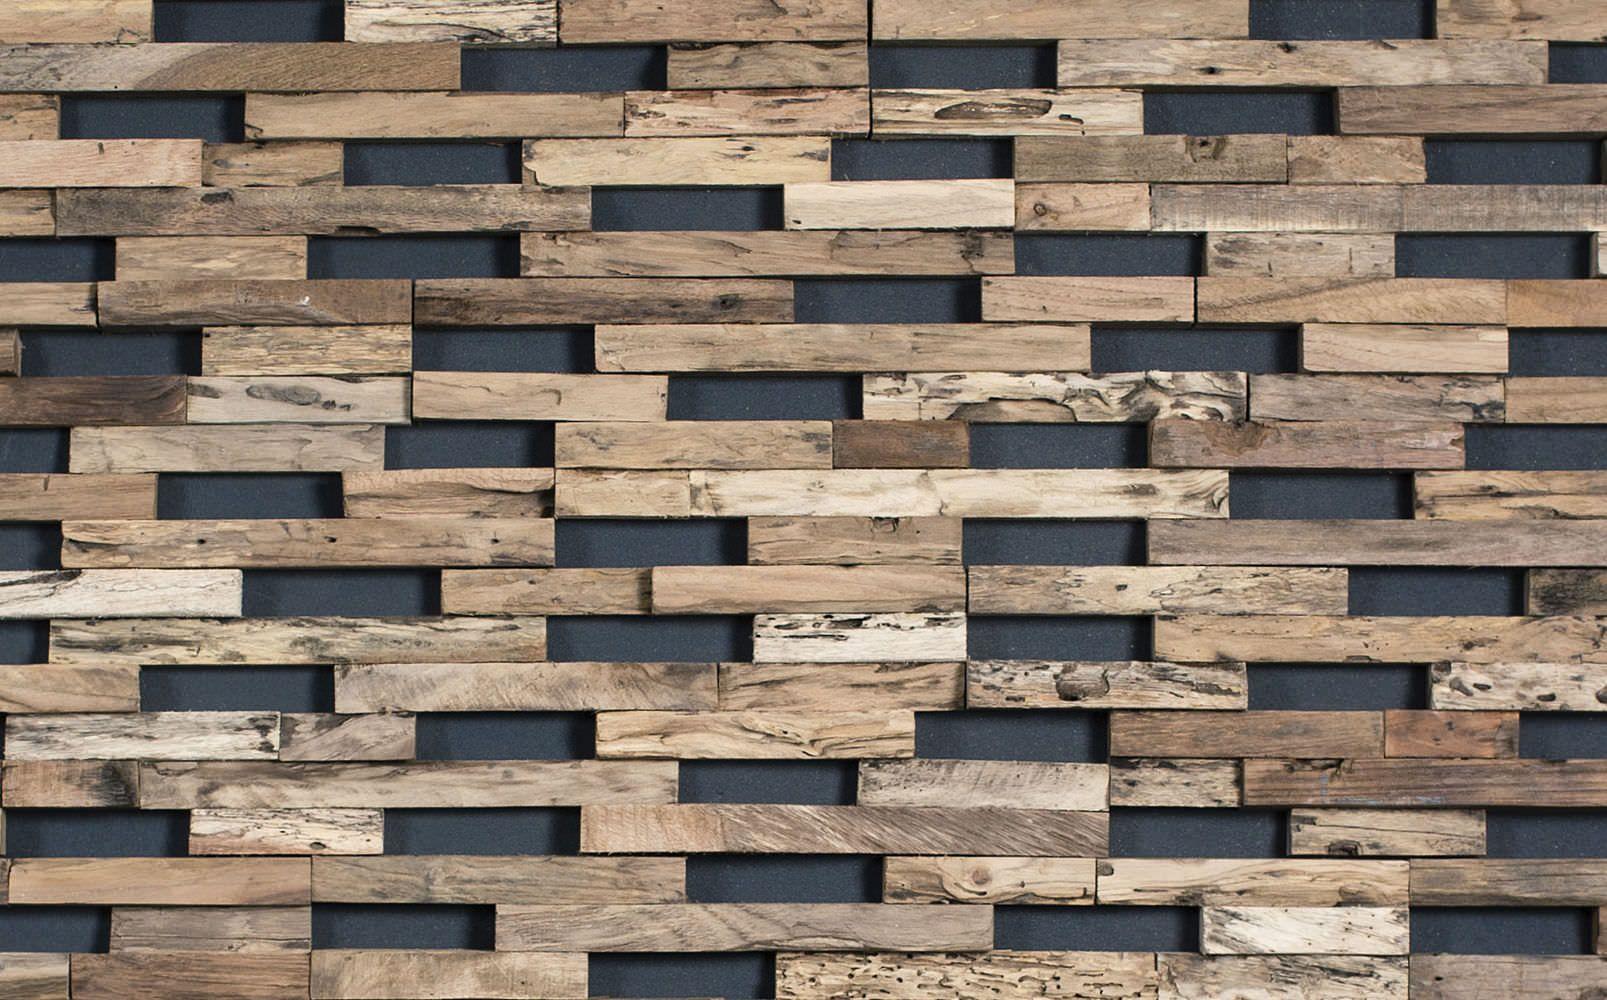 decorative wood wall tiles. Wooden Wall Decorative Panel   Modern Interior Design Ideas Wood Tiles T